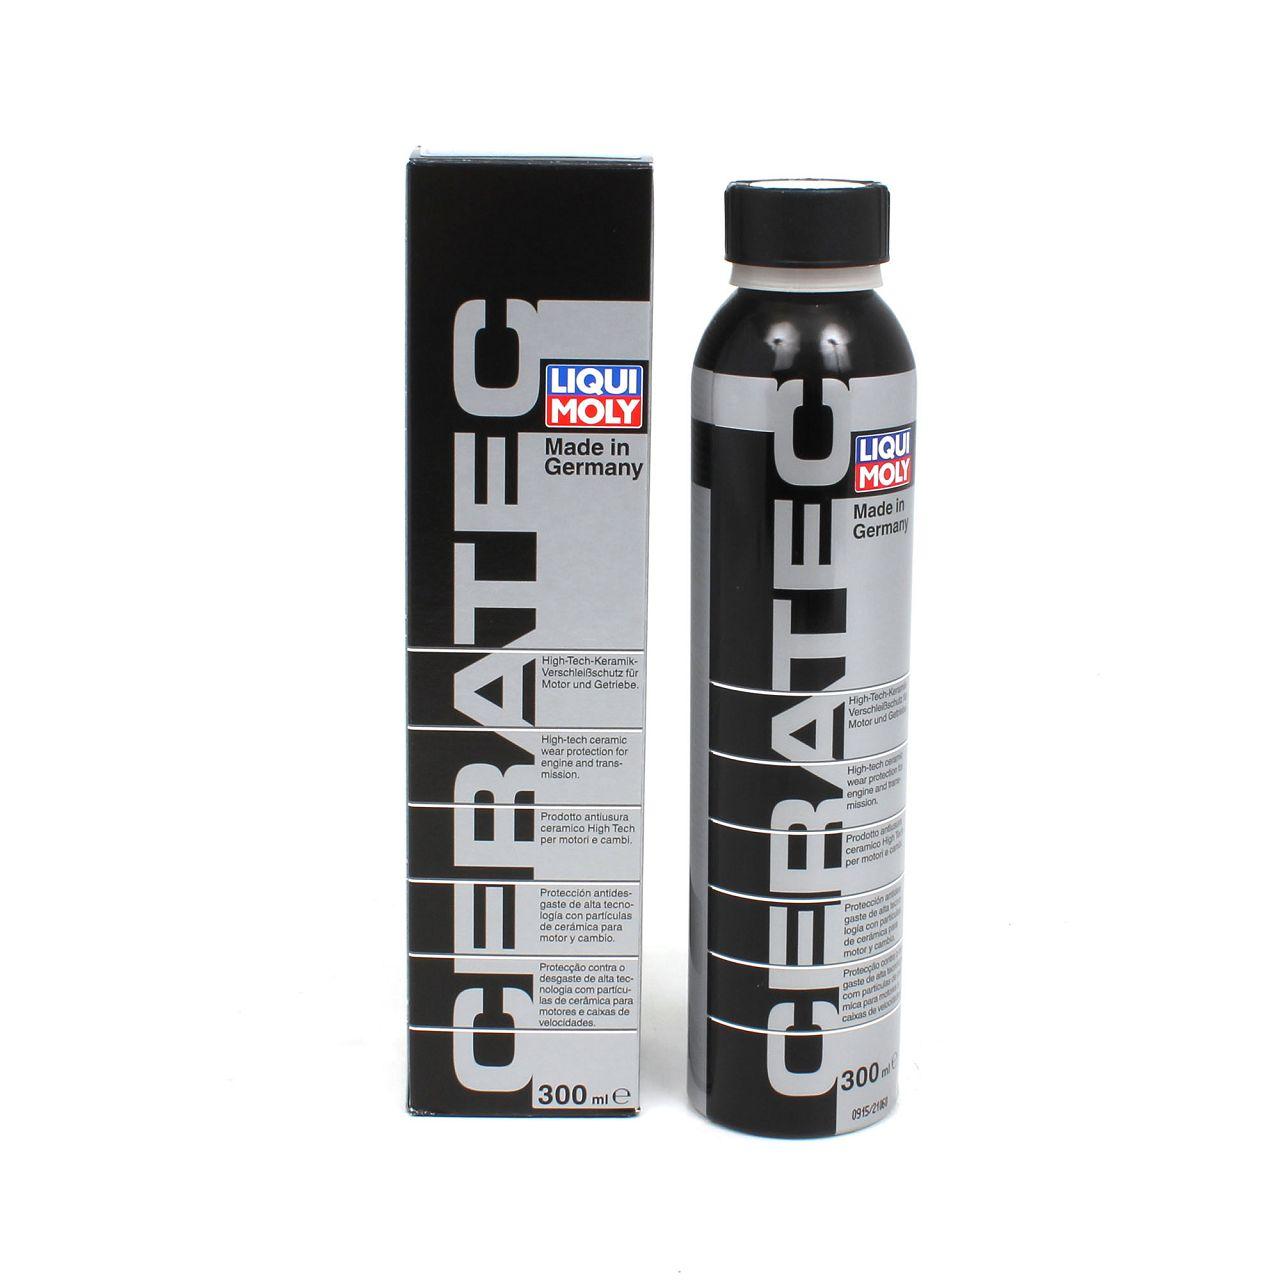 LIQUI MOLY Cera Tec Keramik Verschleißschutz Öl Additiv Ceratec 3721 300ml